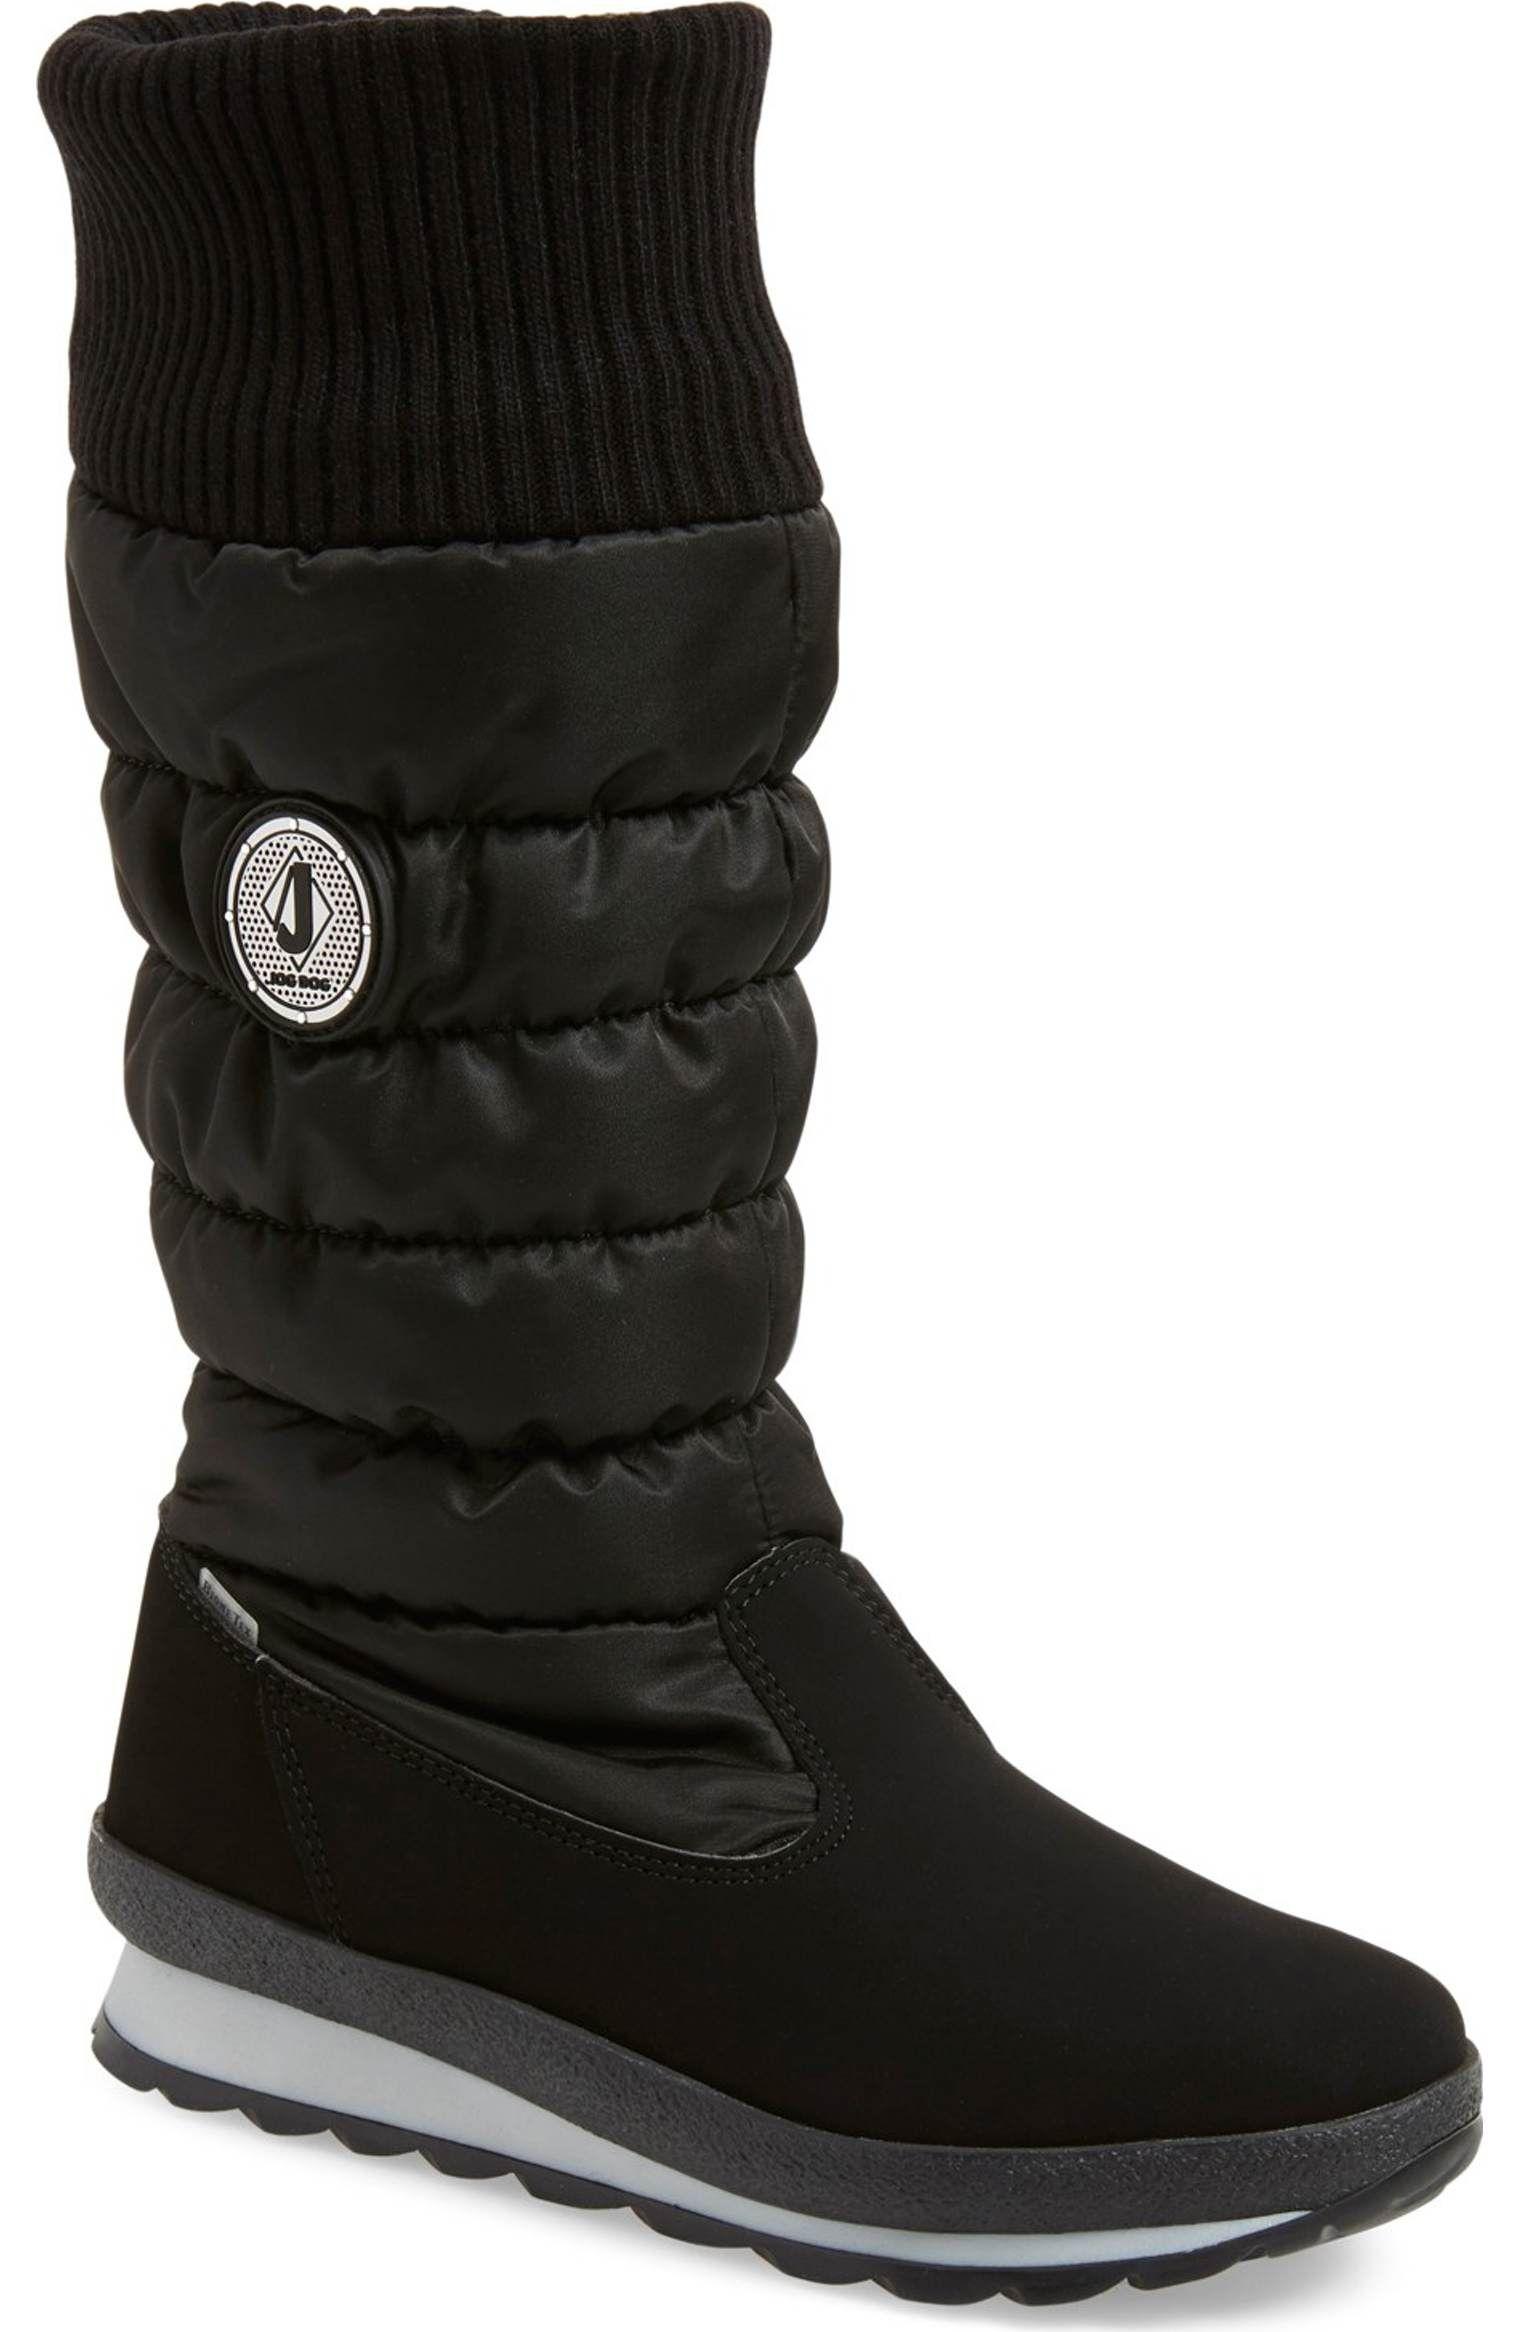 4bd6e81a797c Main Image - JOG DOG Waterproof Winter Boot (Women)